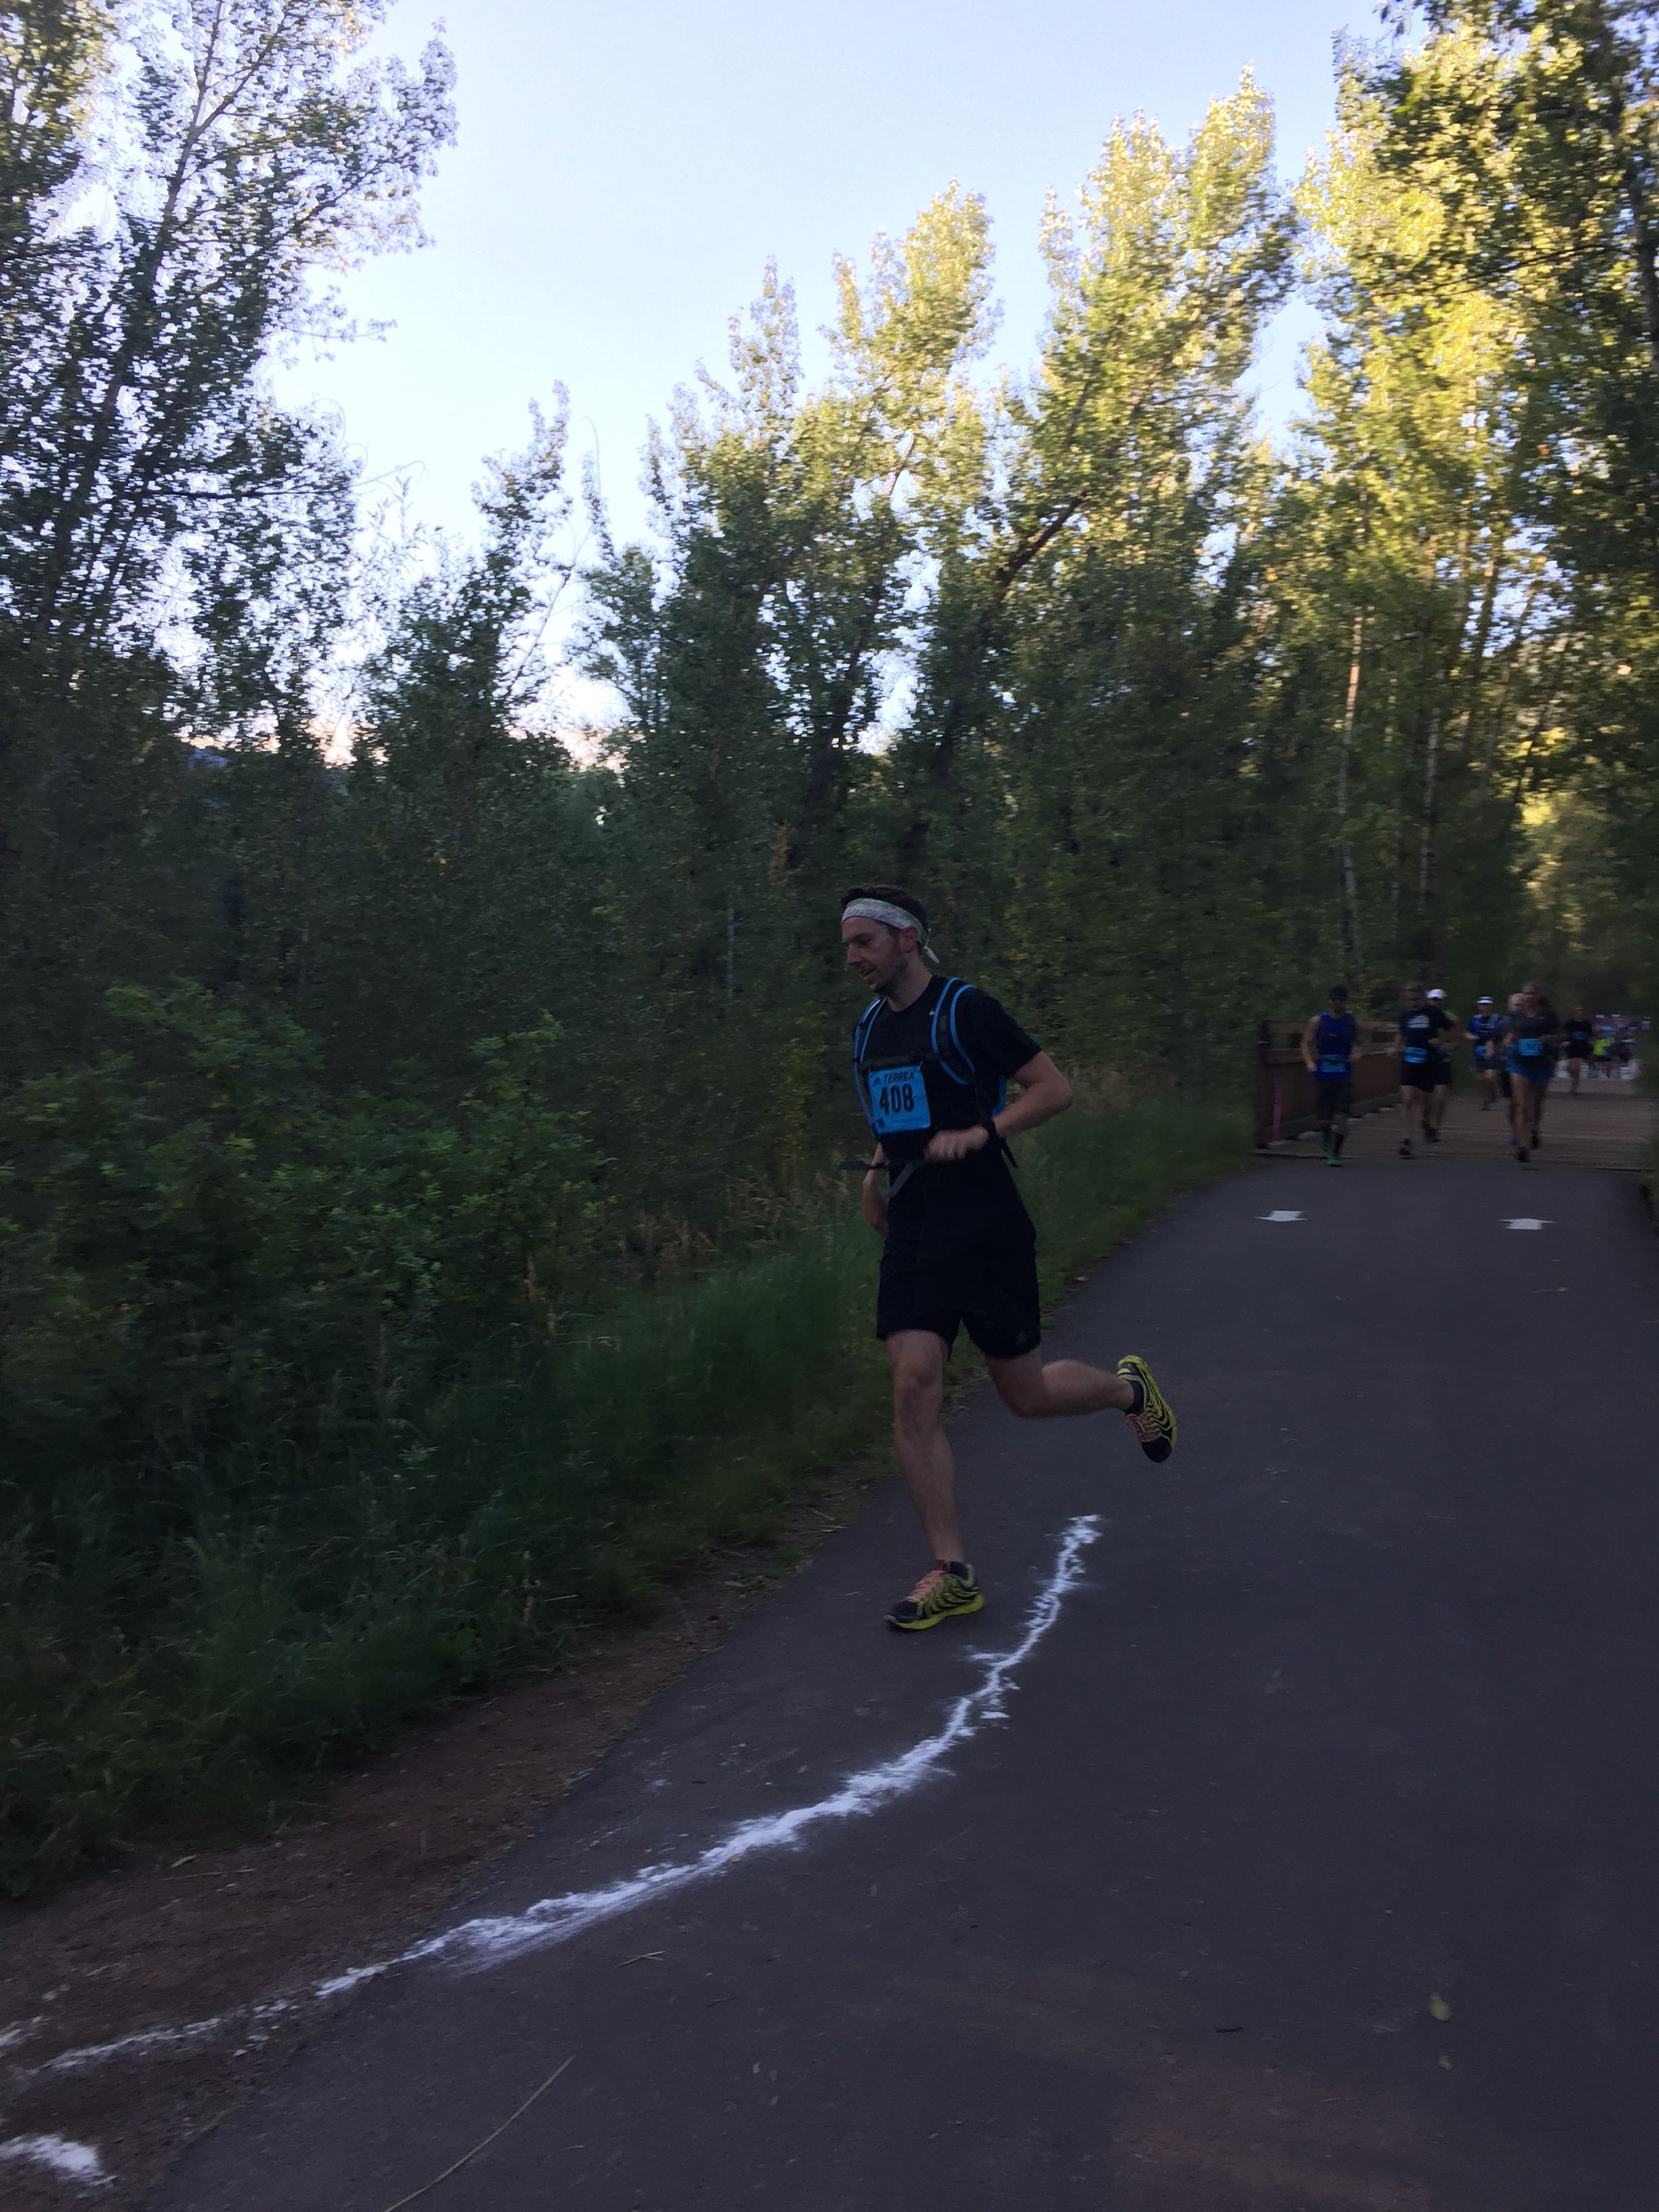 Alex on course, a quarter mile into the 13.1 mile race.